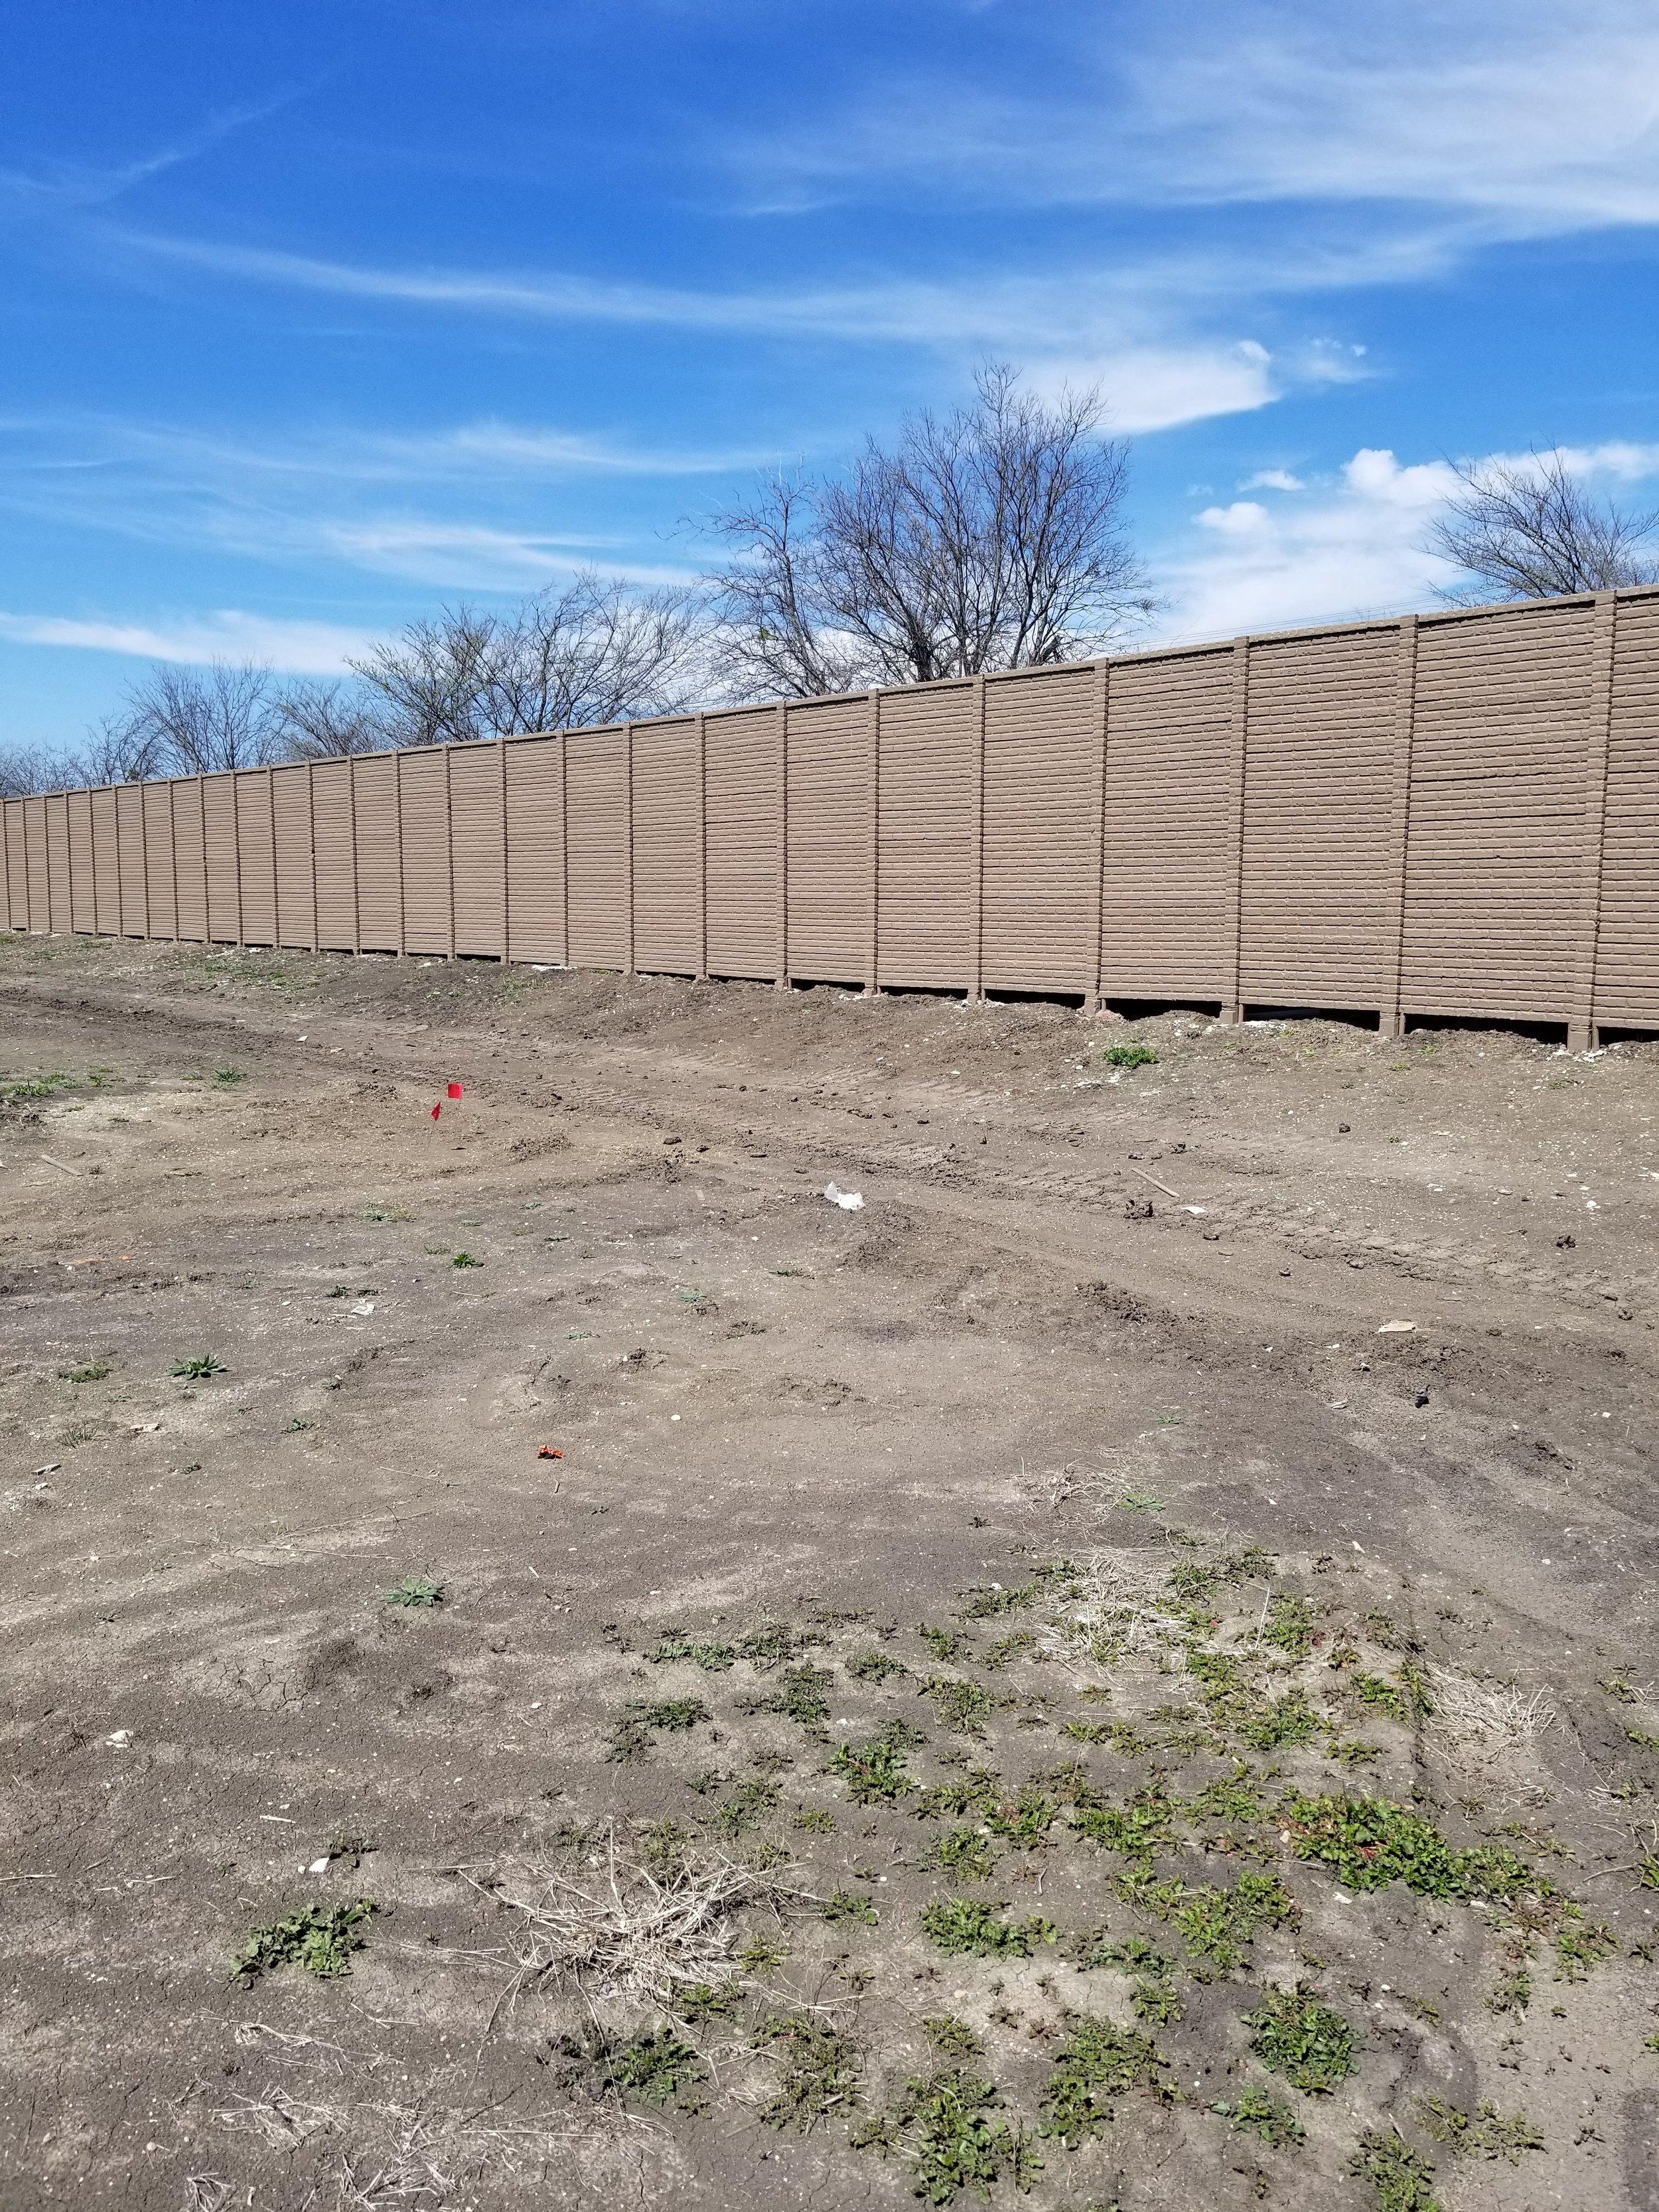 OldBrick Precast Fence - Fort Worth, TX 1.jpg